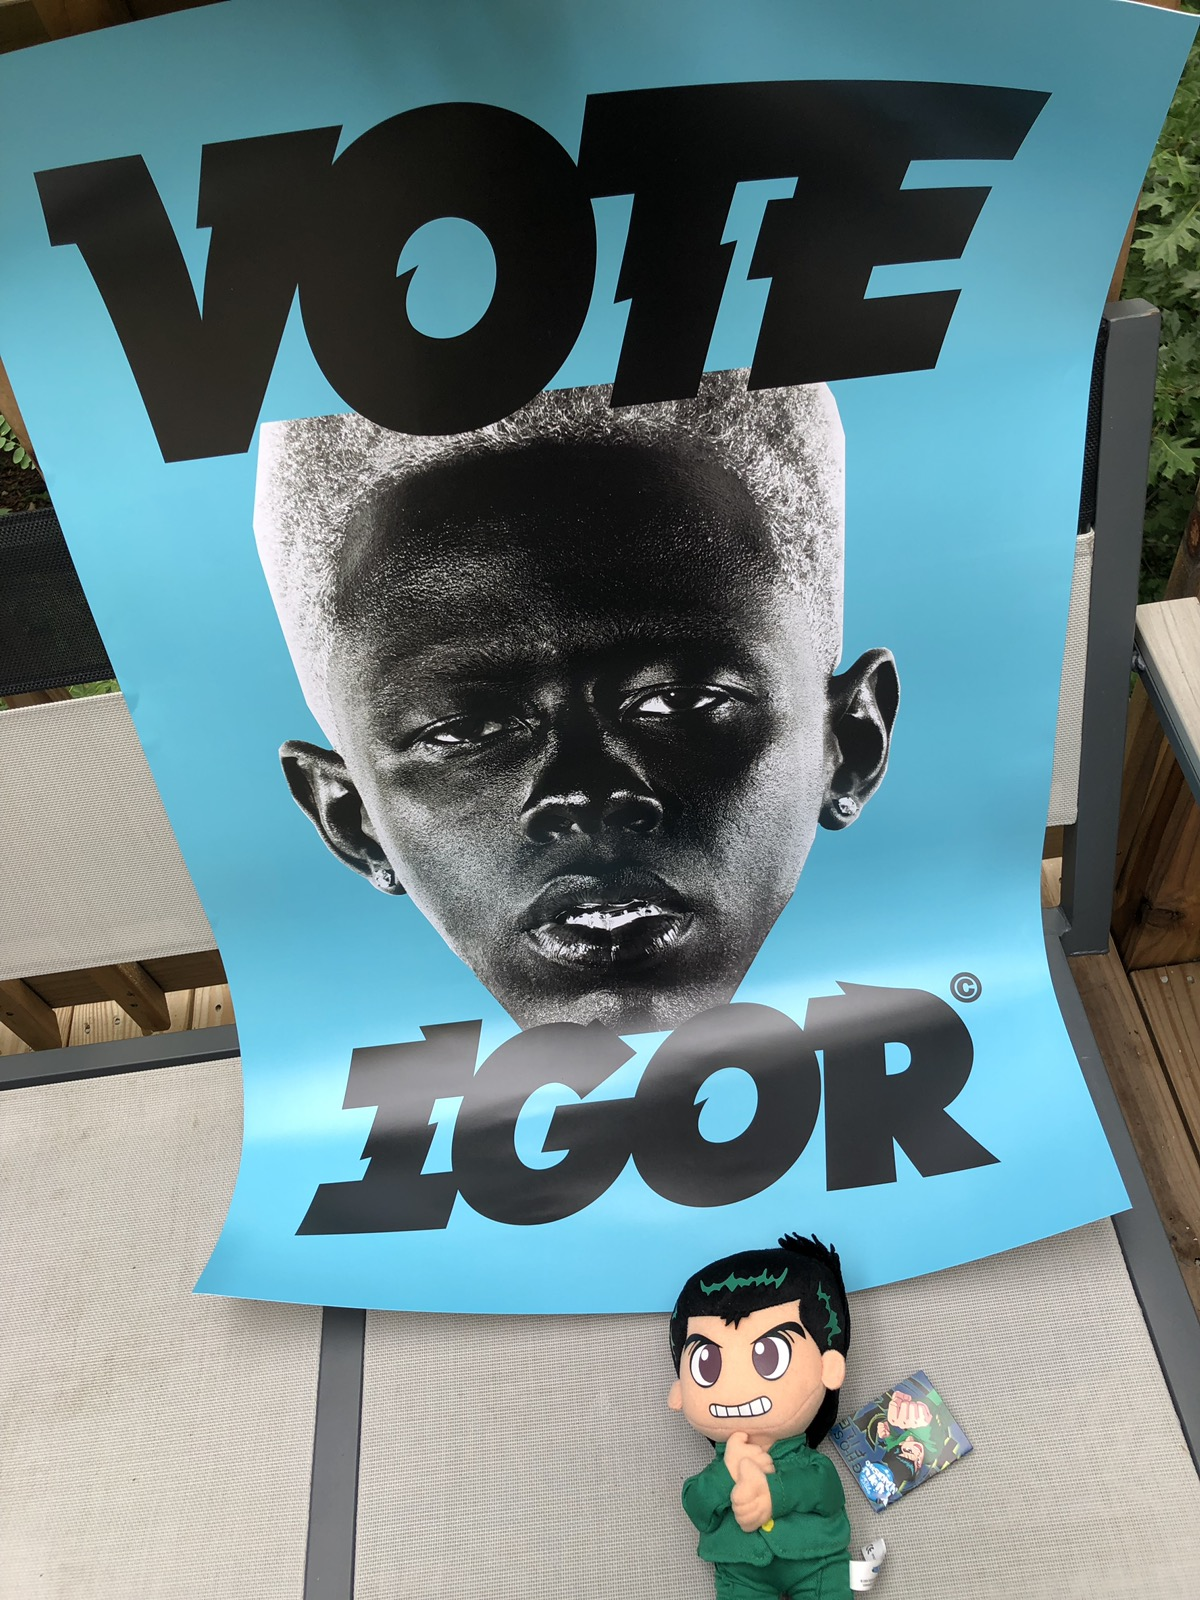 golf wang golf wang vote igor poster blue